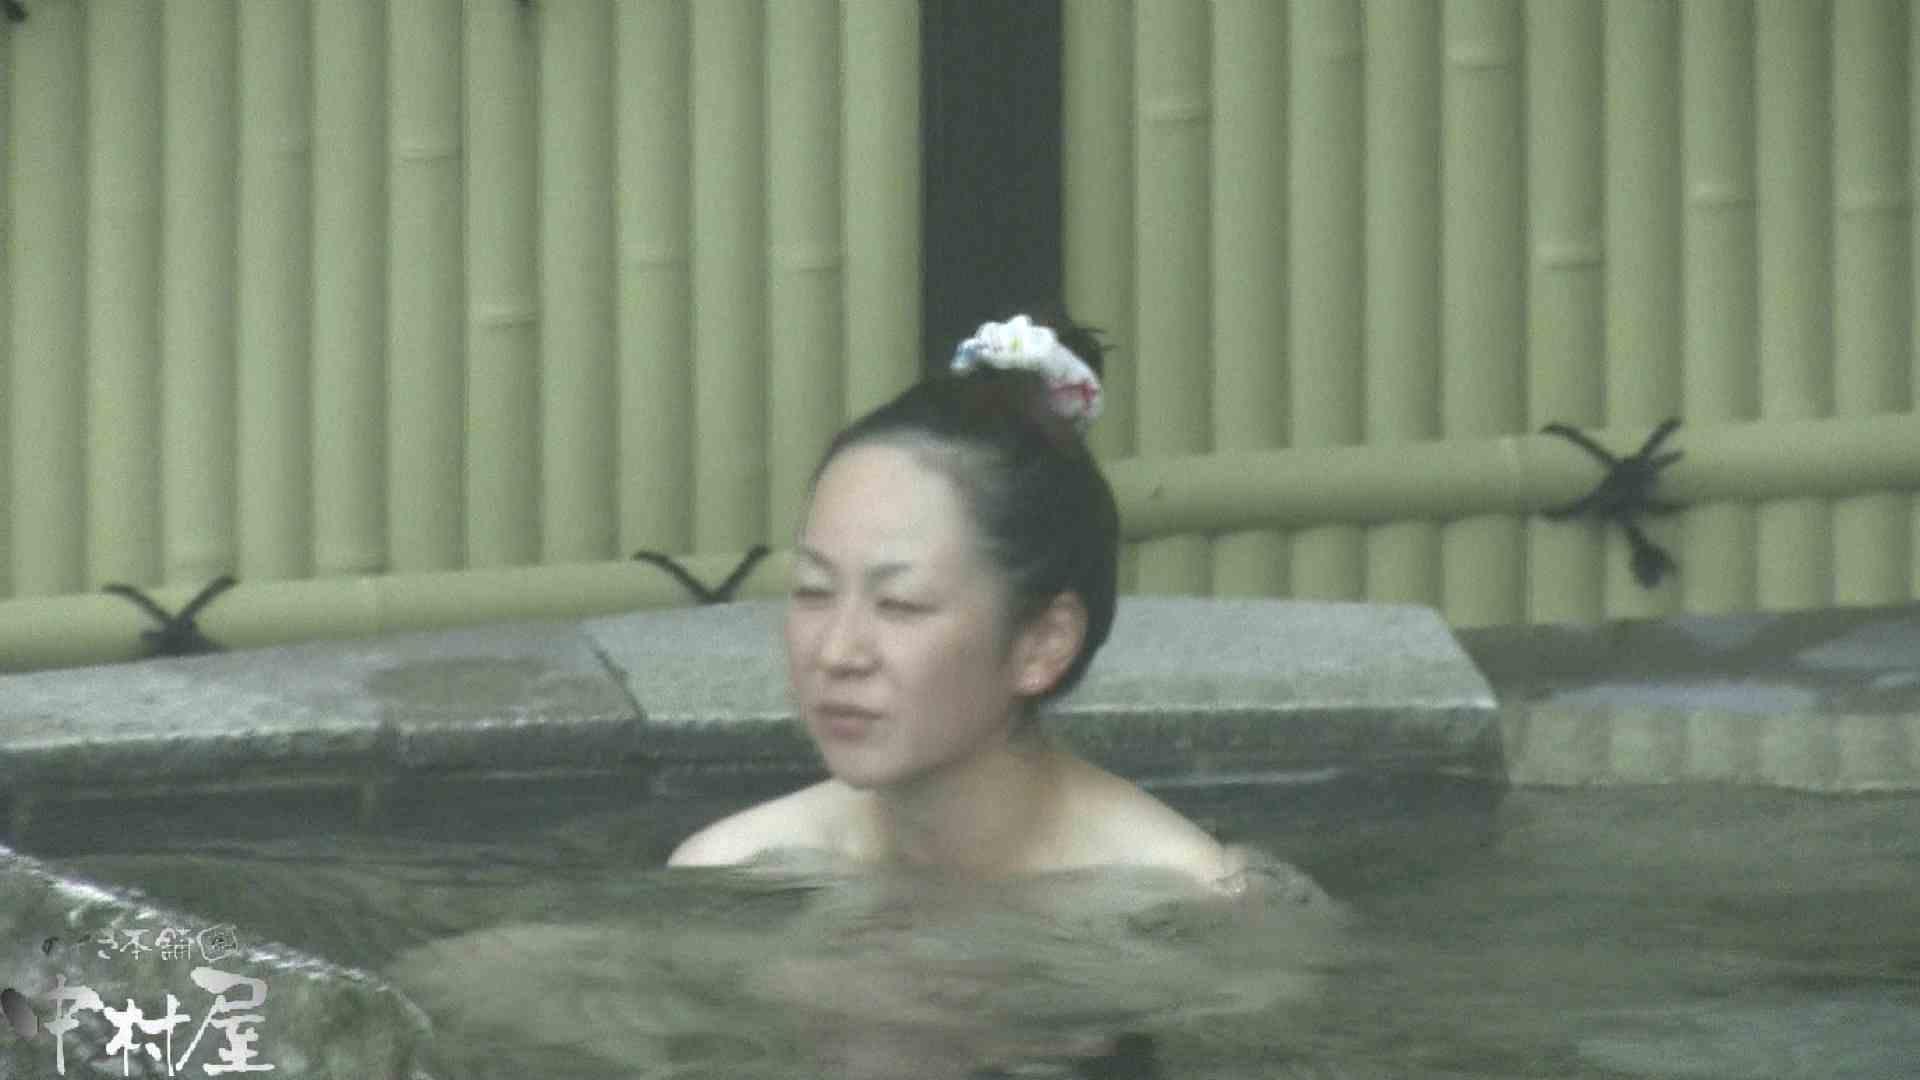 Aquaな露天風呂Vol.911 0   0  88連発 23